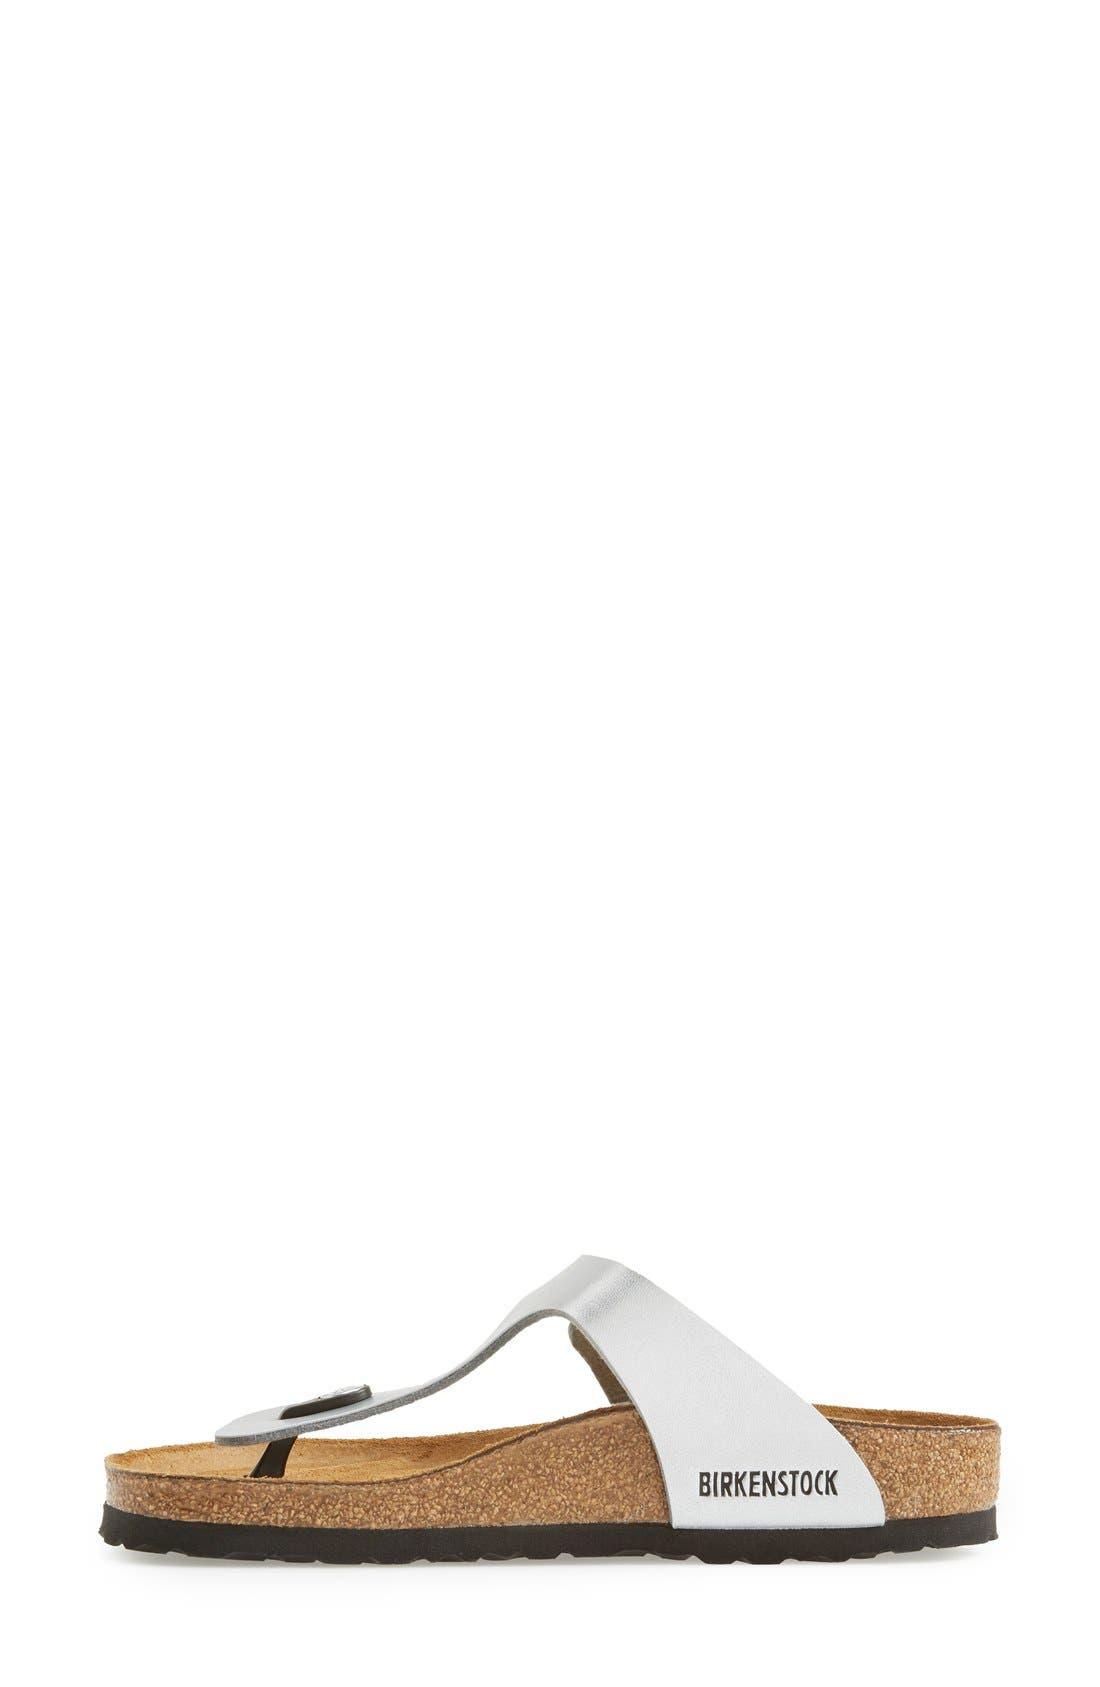 Birkenstock All Women Nordstrom Sandal Connec Arizona Navy Fuchsia Woman 36